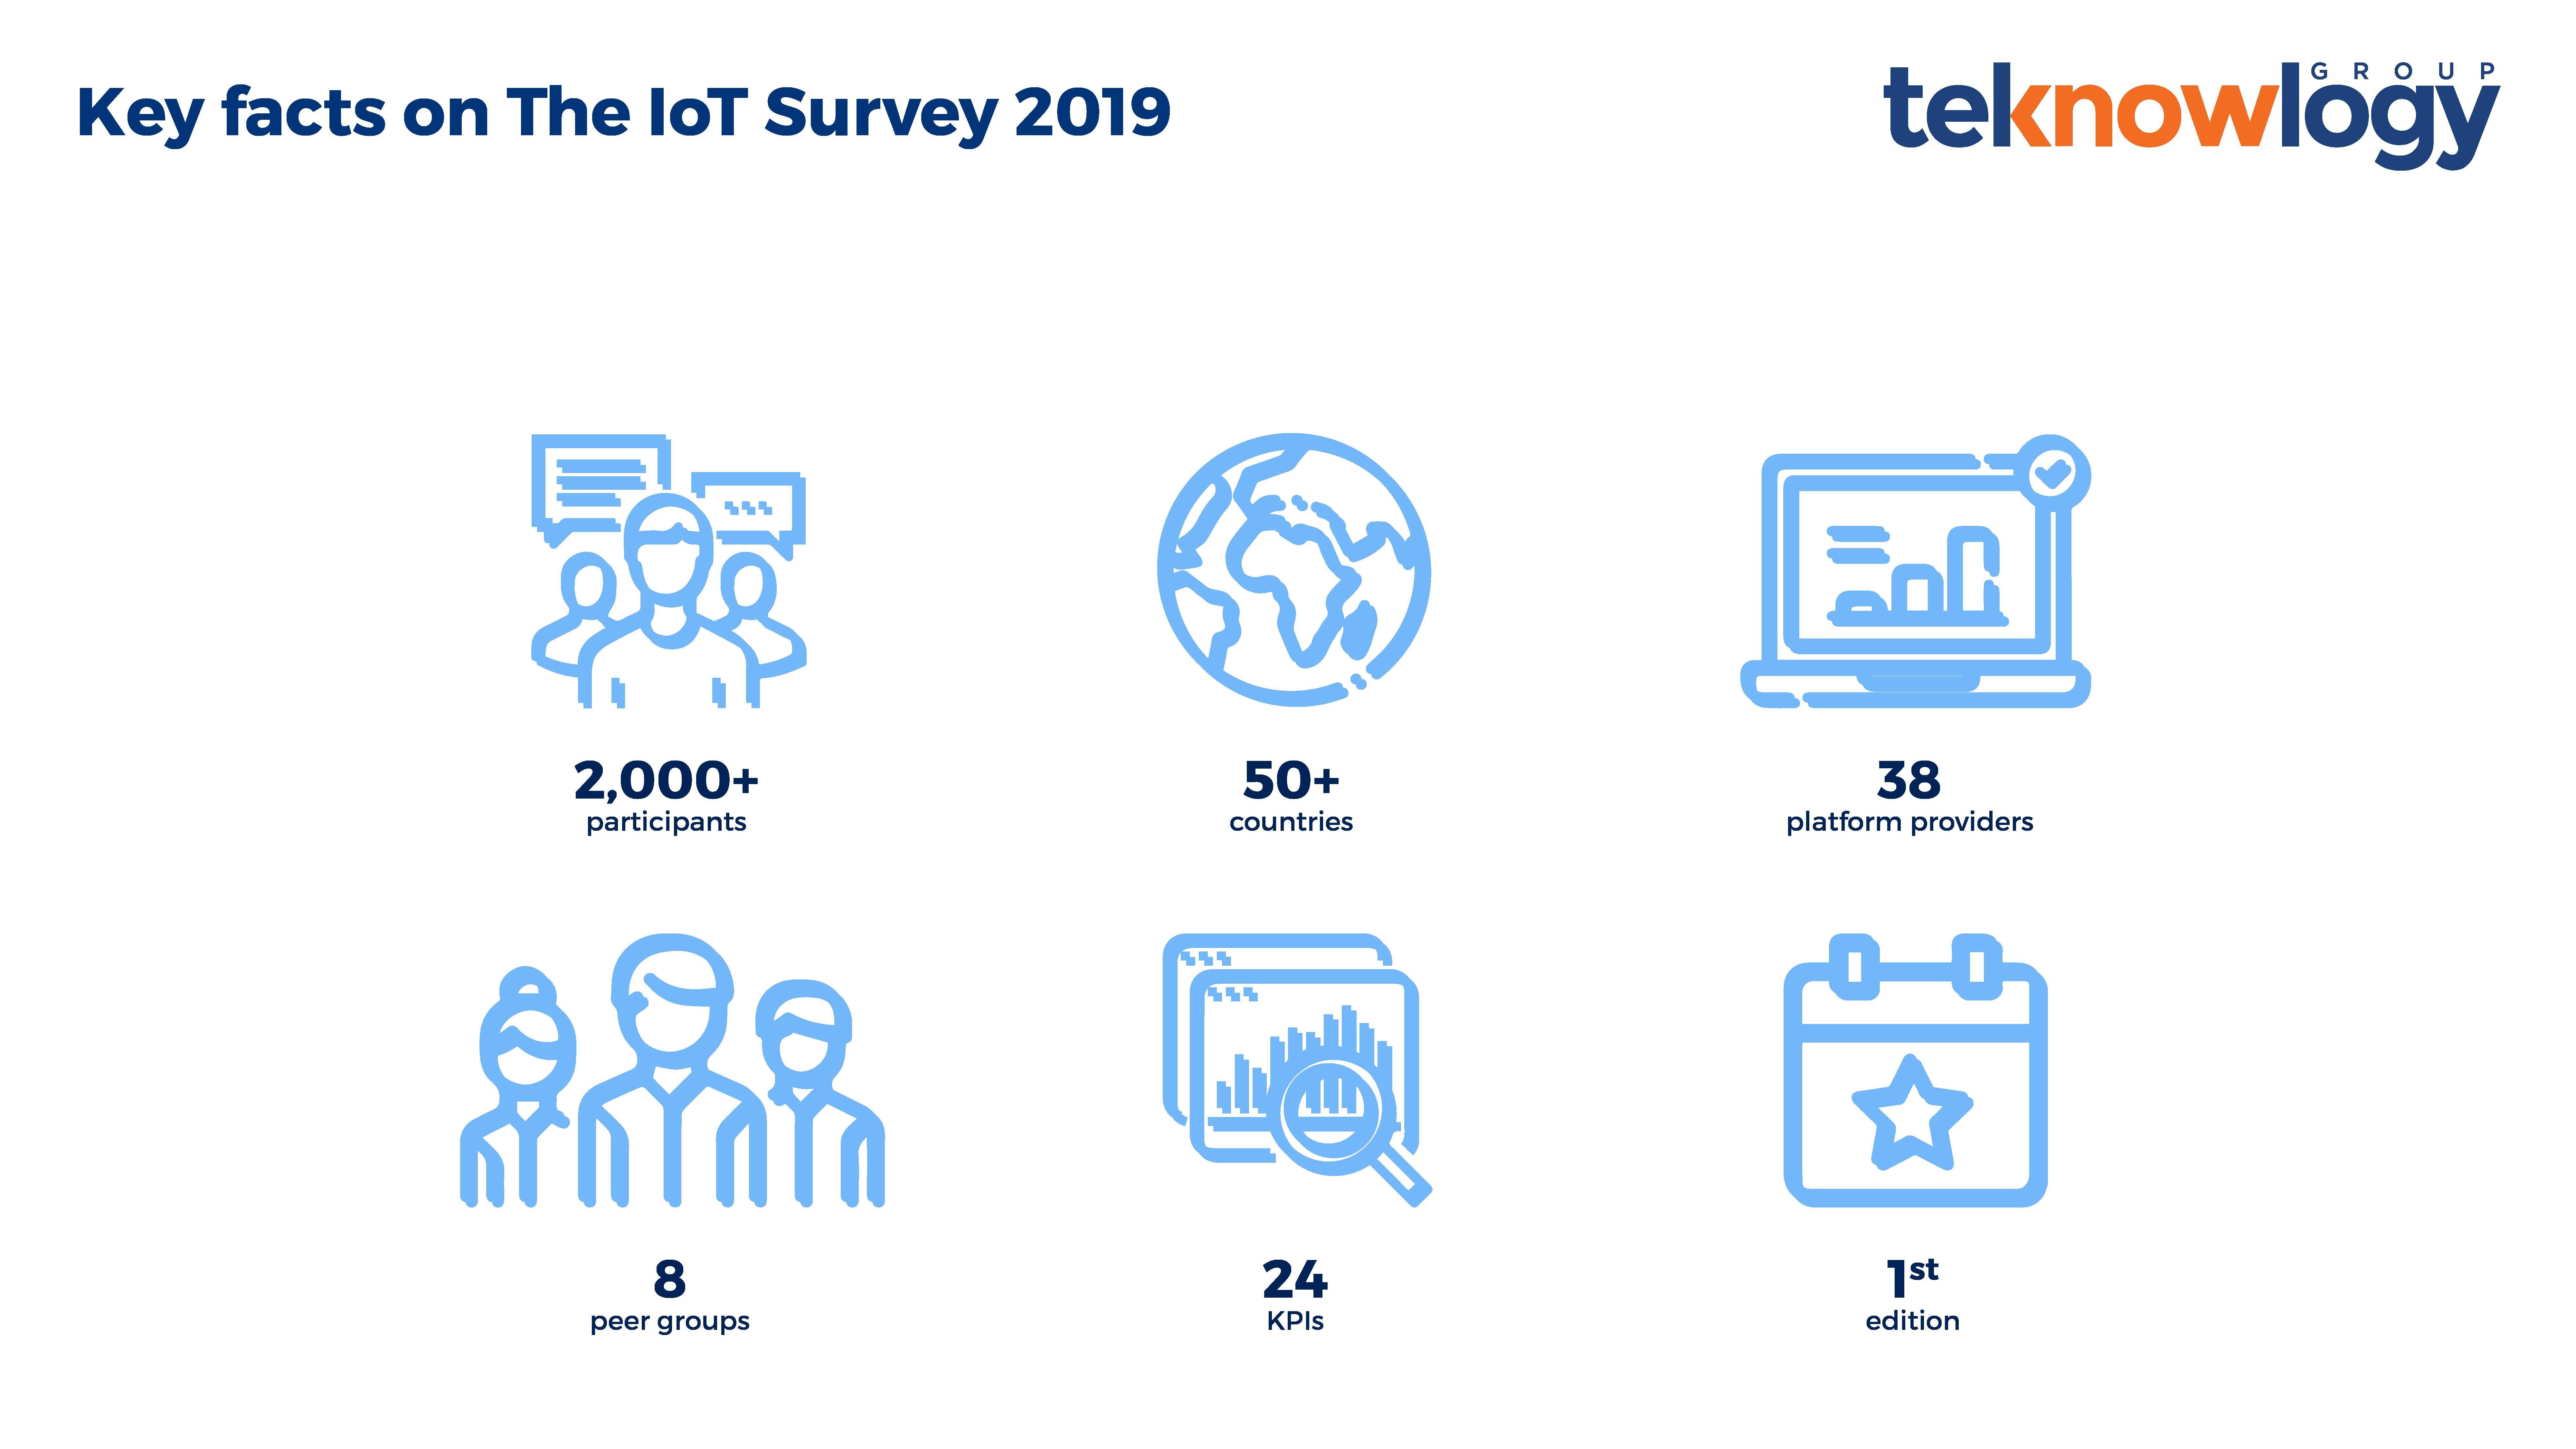 key figures The IoT Survey 2019